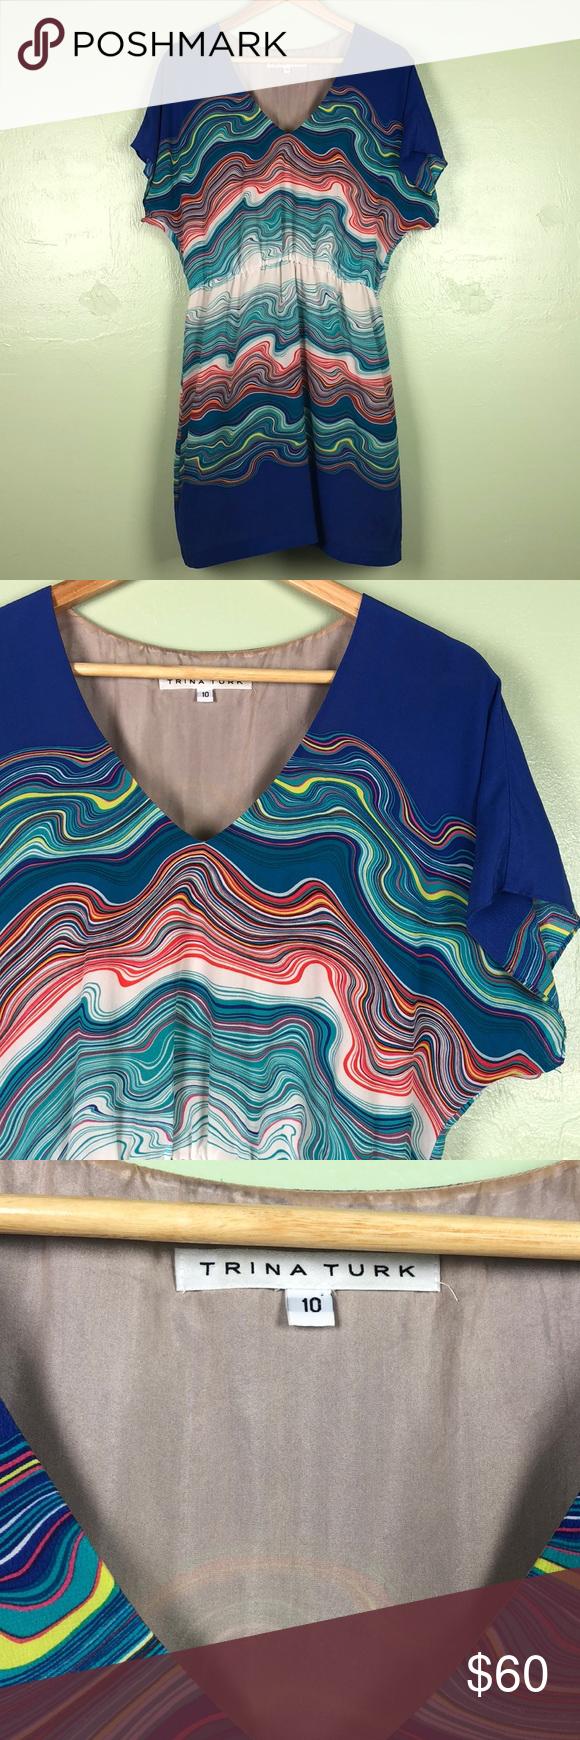 Trina Turk Multicolor Water Ripple Silk Dress Excellent condition. Trina Turk Multicolor Water Ripple pattern Silk Dress. 100% silk. Lined. Absolutely gorgeous. Size 10. Trina Turk Dresses #waterripples